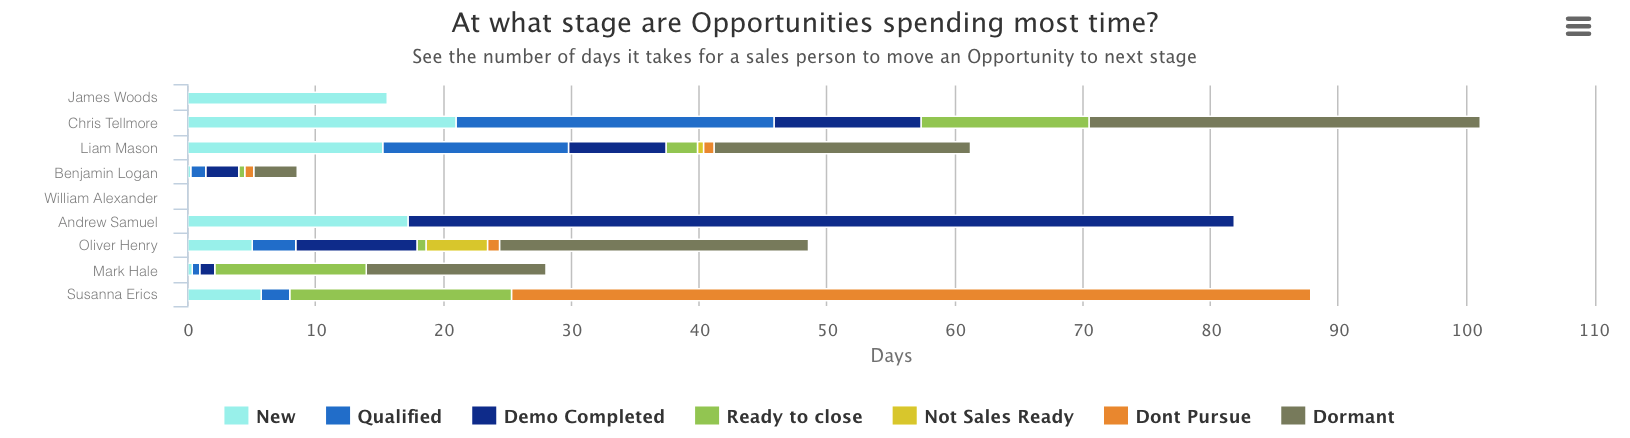 sales_cylce_chart